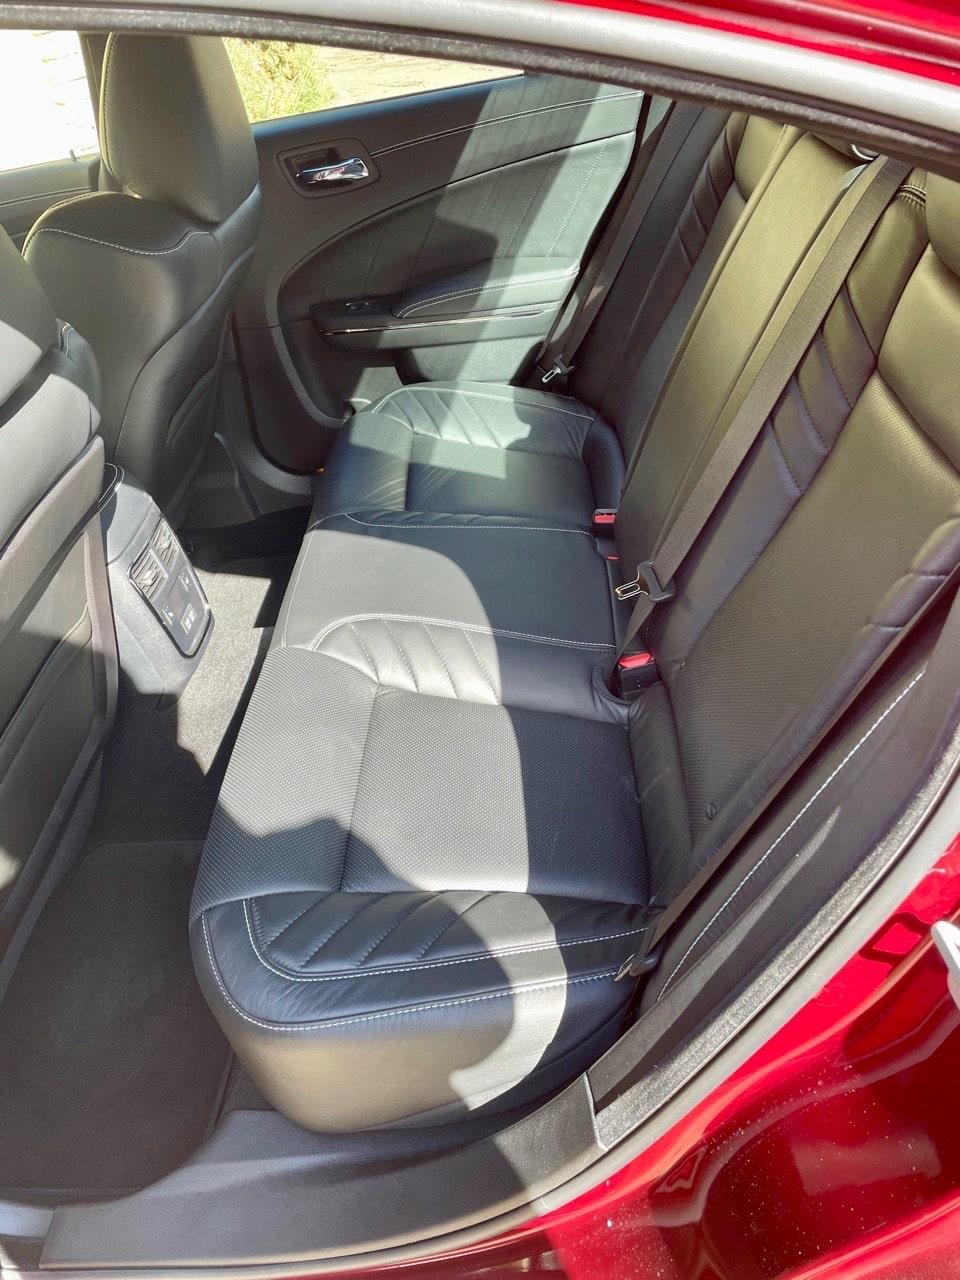 2021 Dodge Charger Hellcat interior